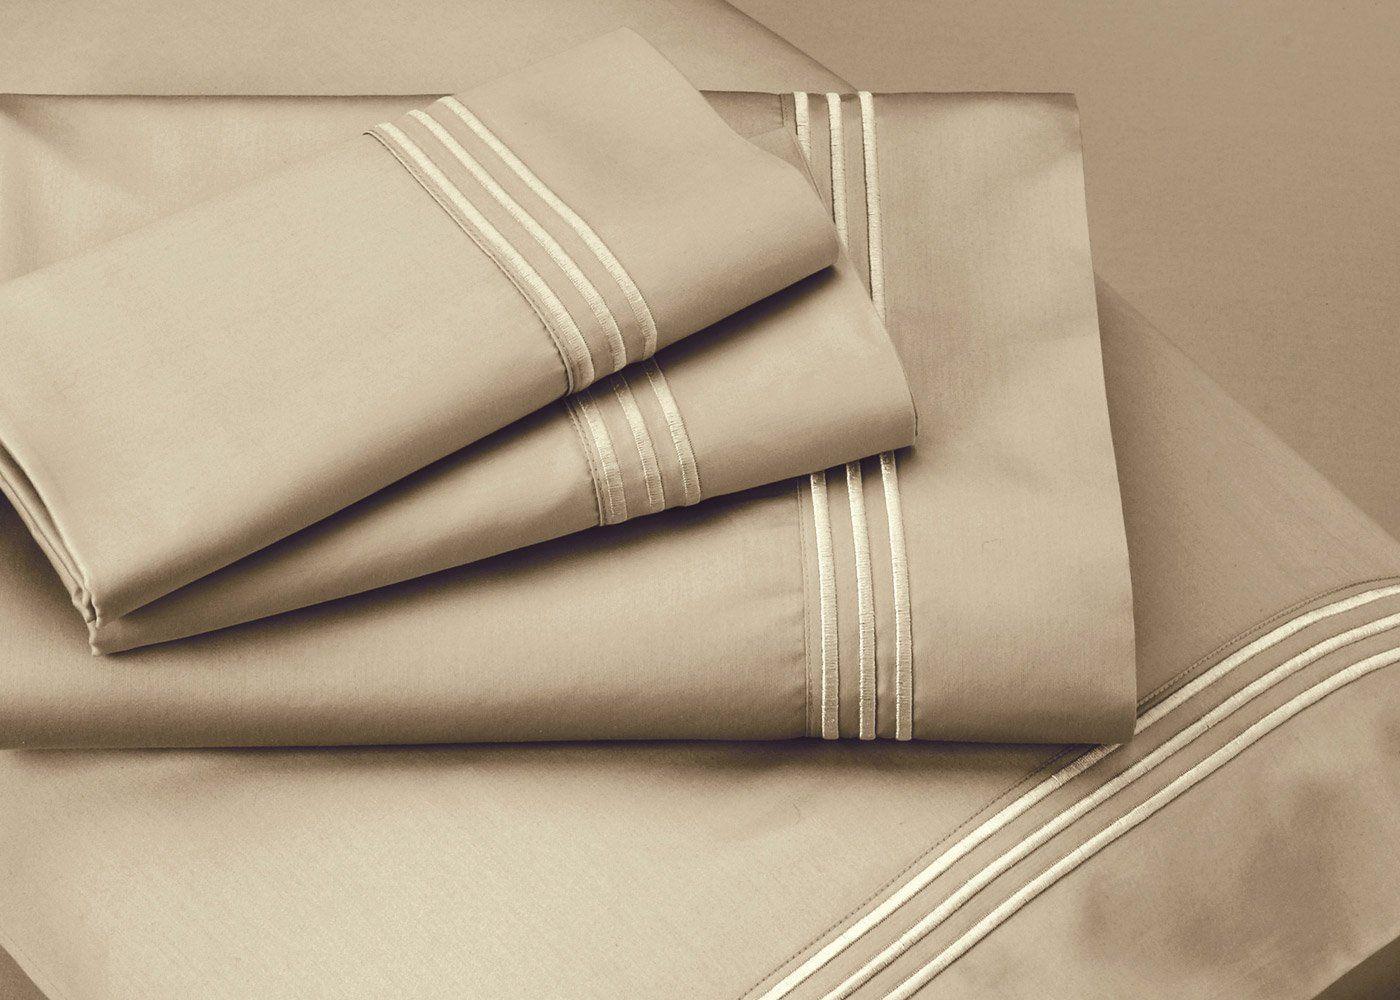 Premium Celliant Sheet Set in 4 Colors - Queen / Sand